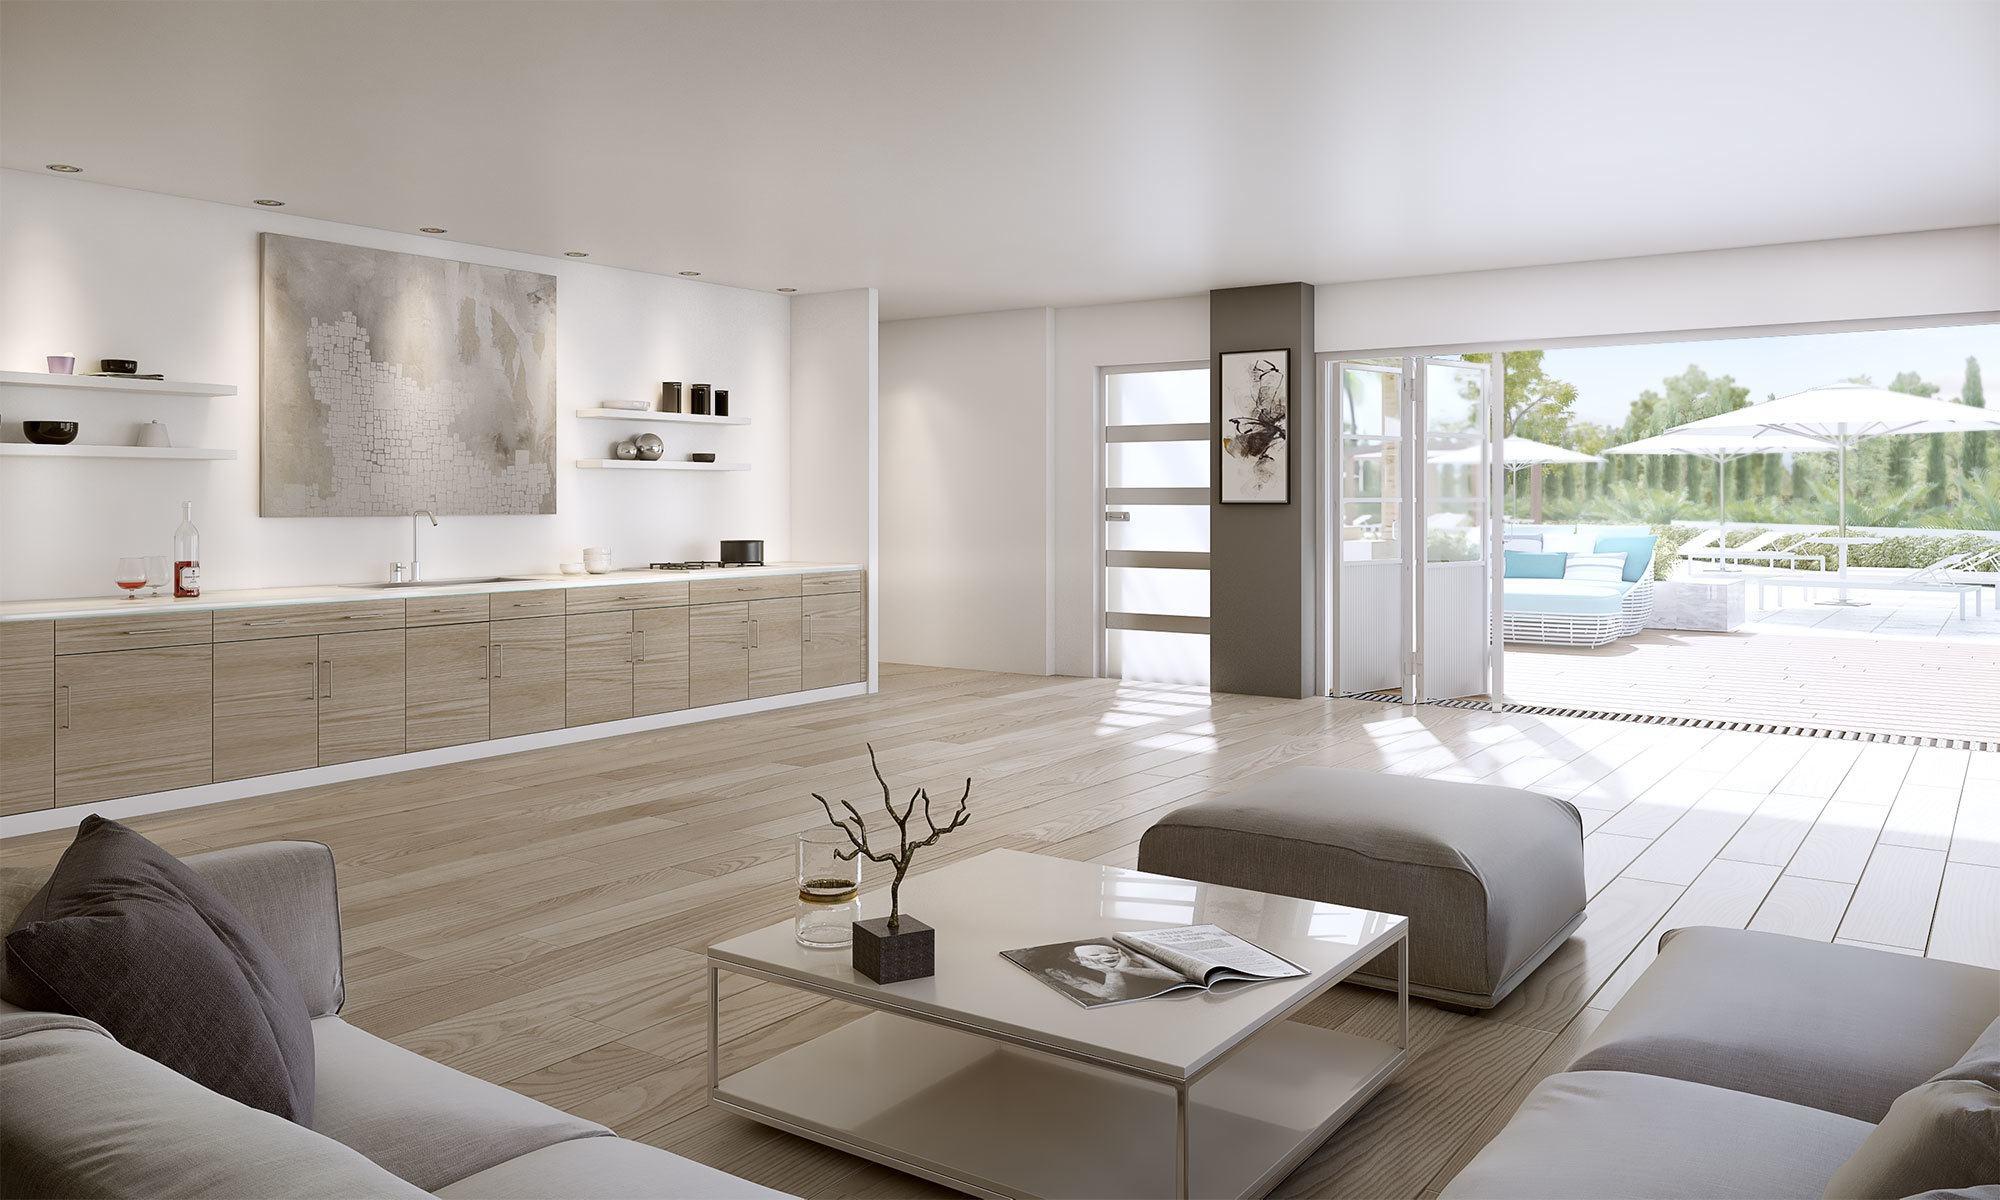 Apartments in Plantation, FL